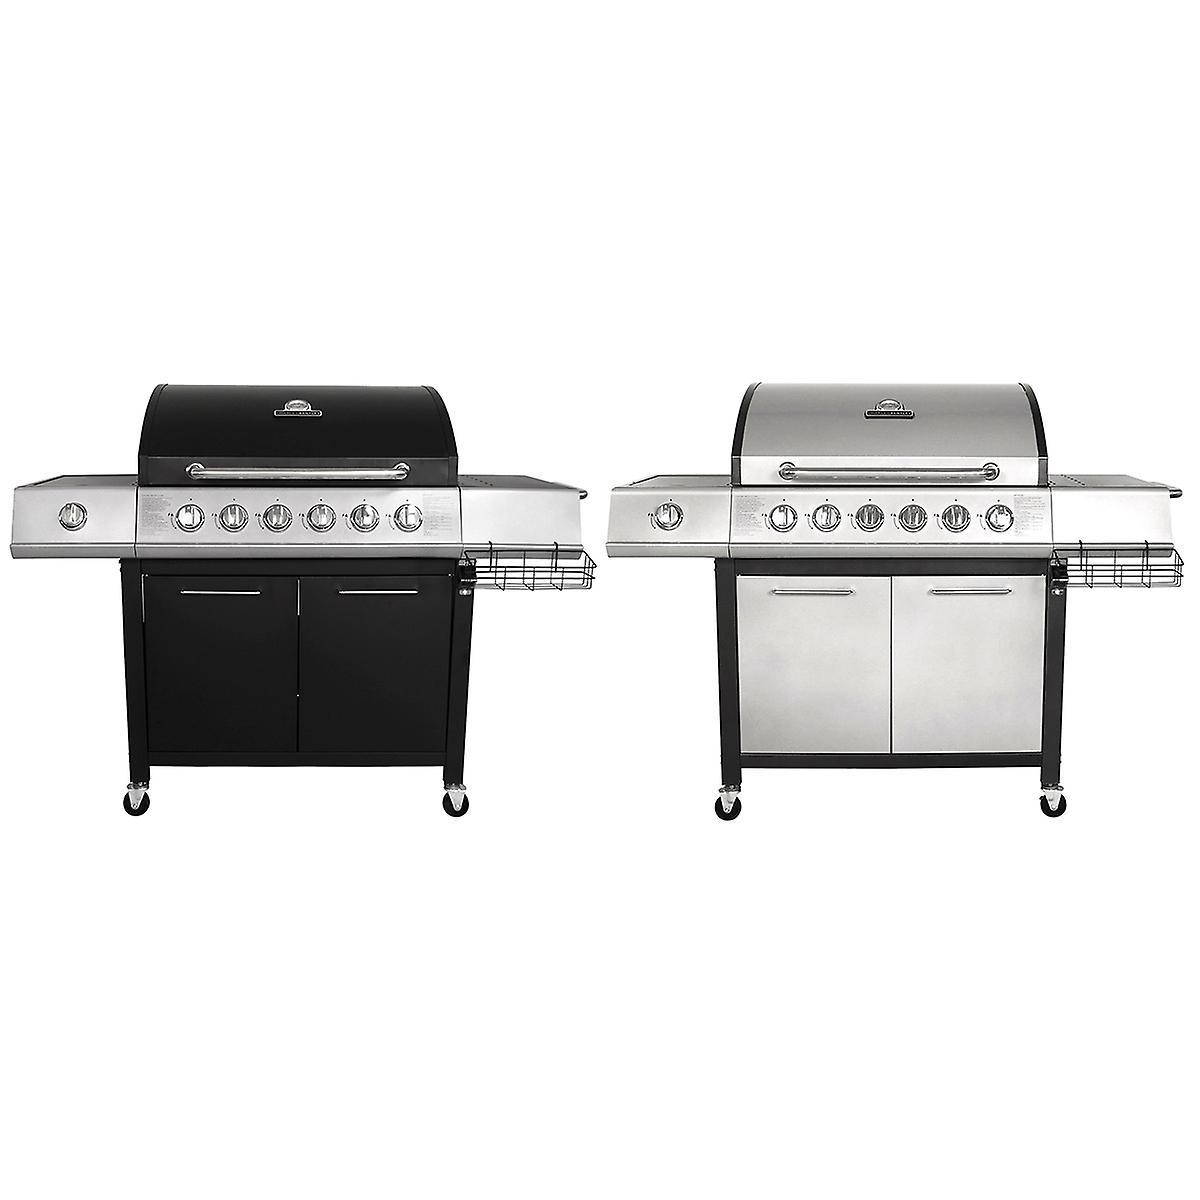 Charles Bentley 7 Burner Premium Gas Bbq Steel Barbecue With Wheels (6X  Burner + 1X Side Burner) - Black & Grey Colours Available